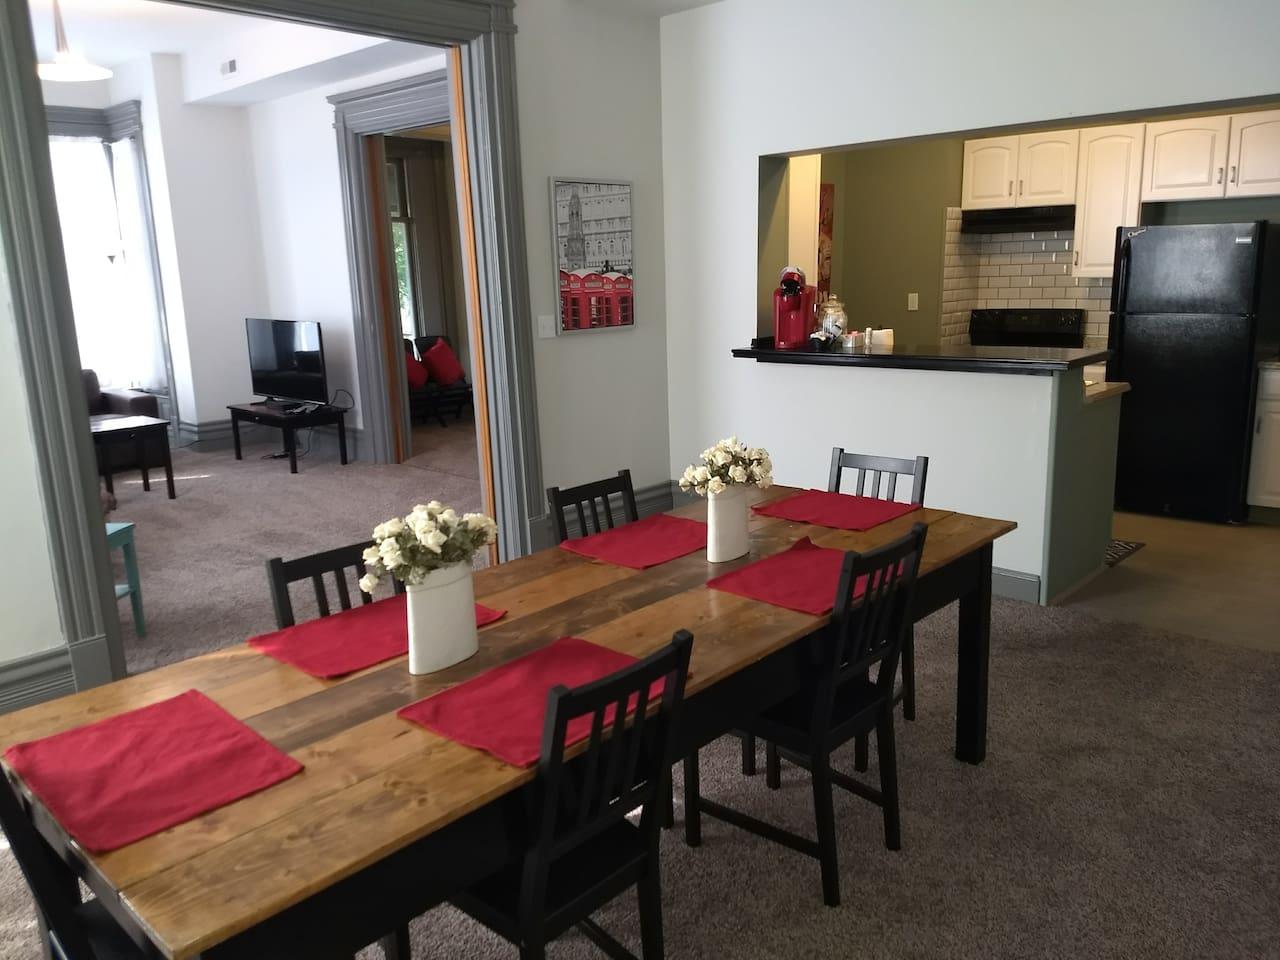 Open, light filled apartment